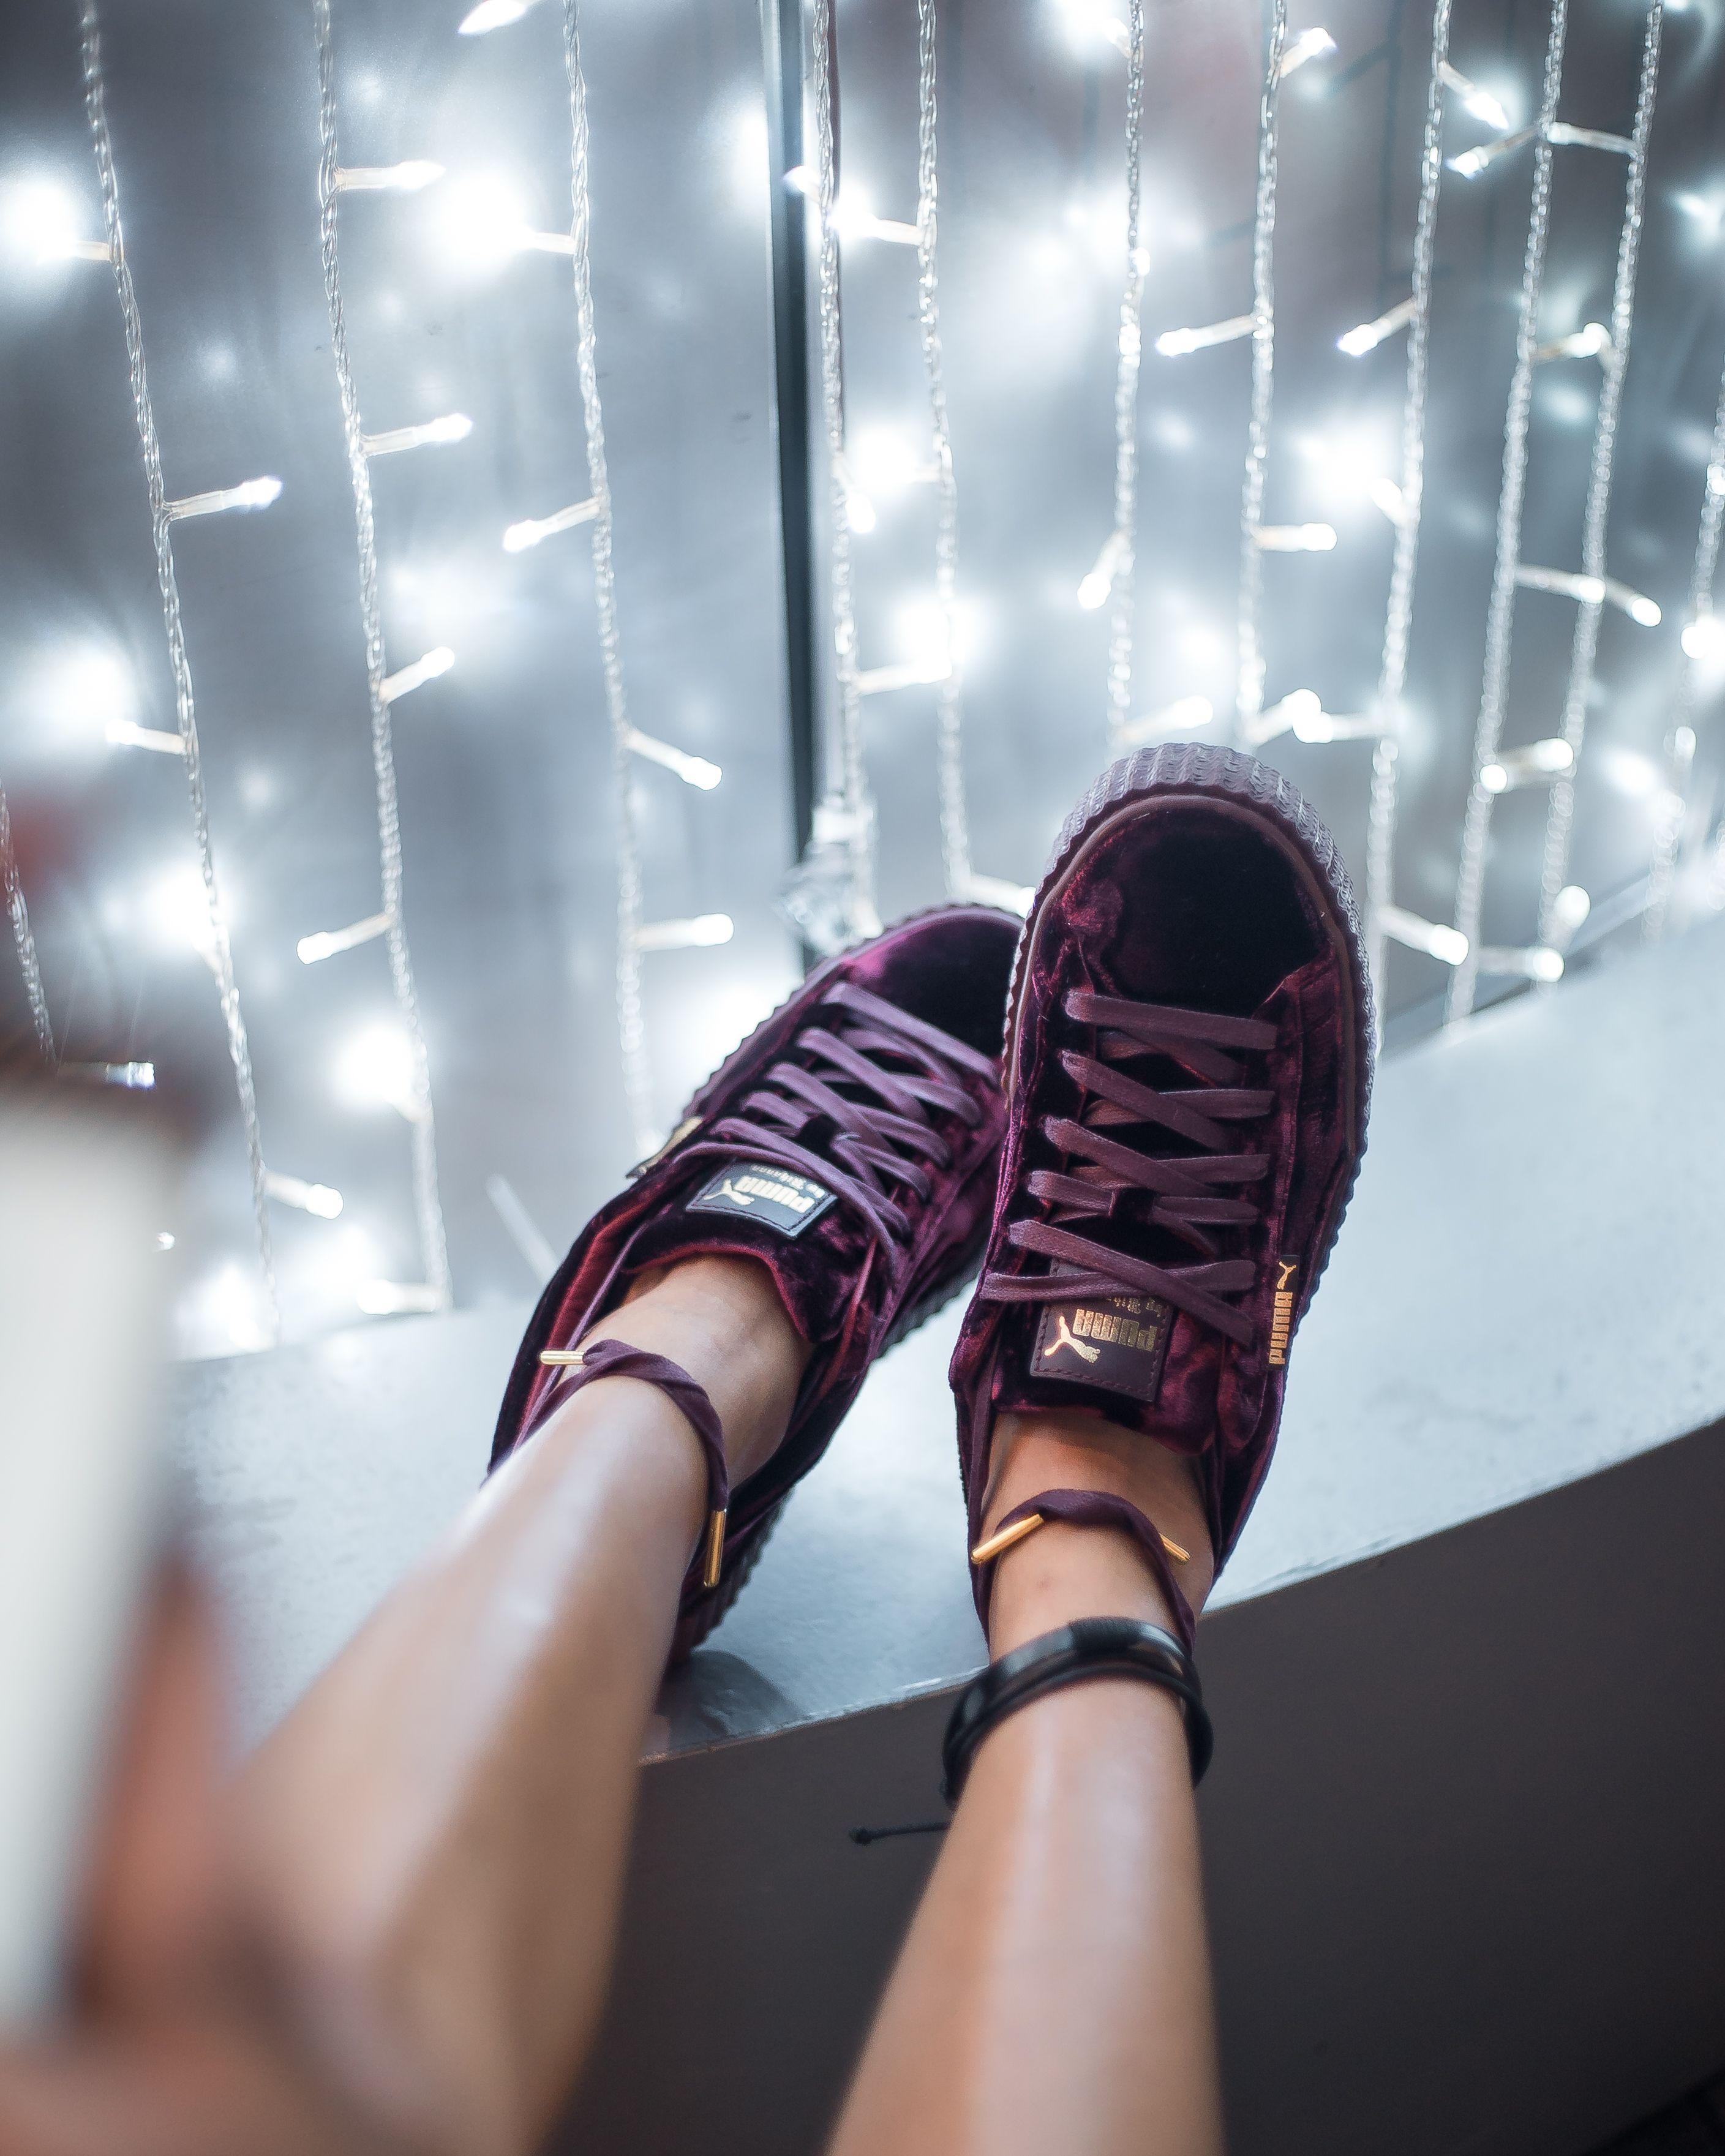 separation shoes abce8 46027 Fenty X Puma Velvet Creepers Burgundy | wardrobe | Puma ...